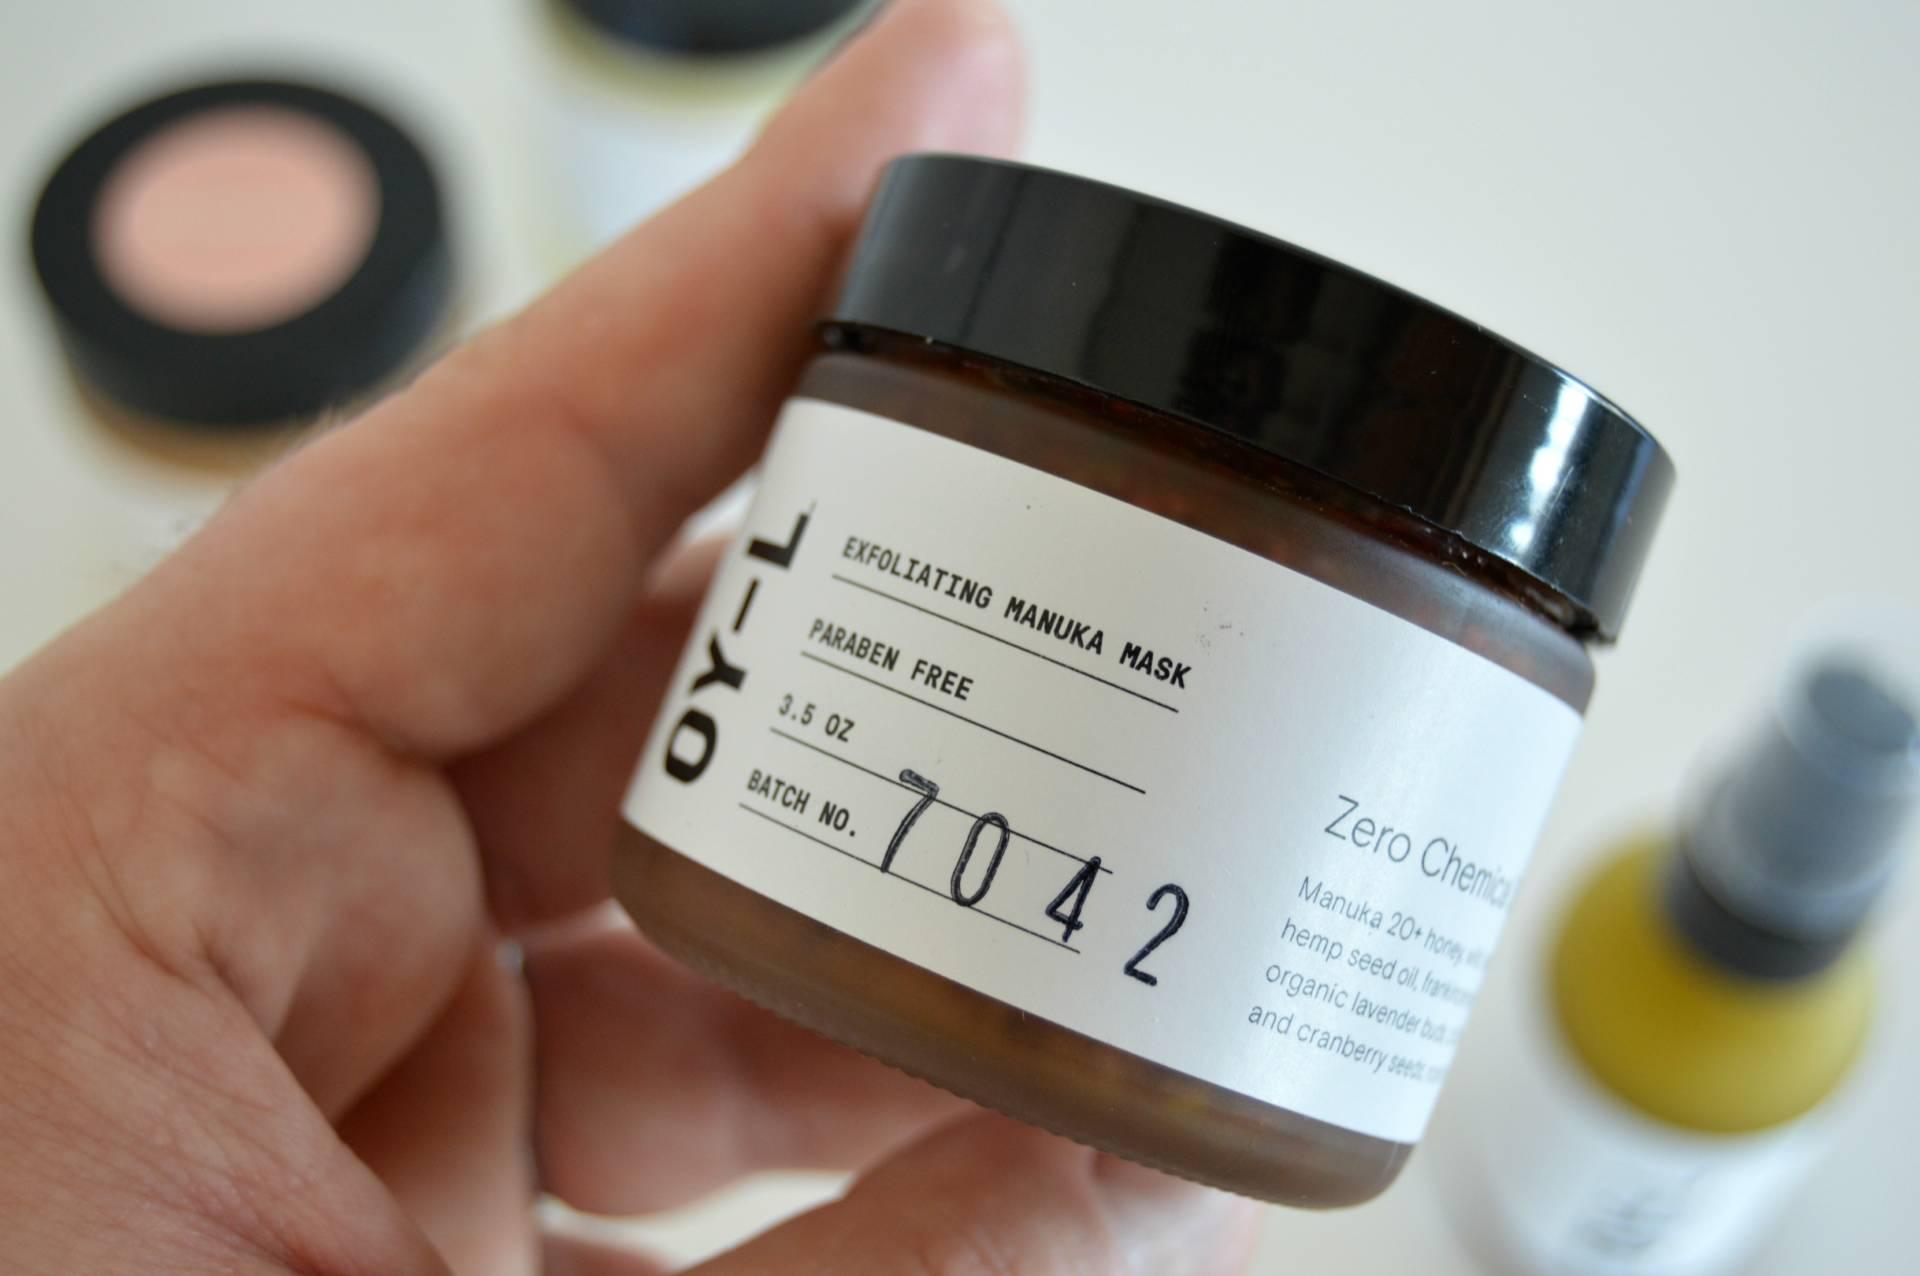 oy-l-manuka-mask-batch-paraben-free-inhautepursuit-review